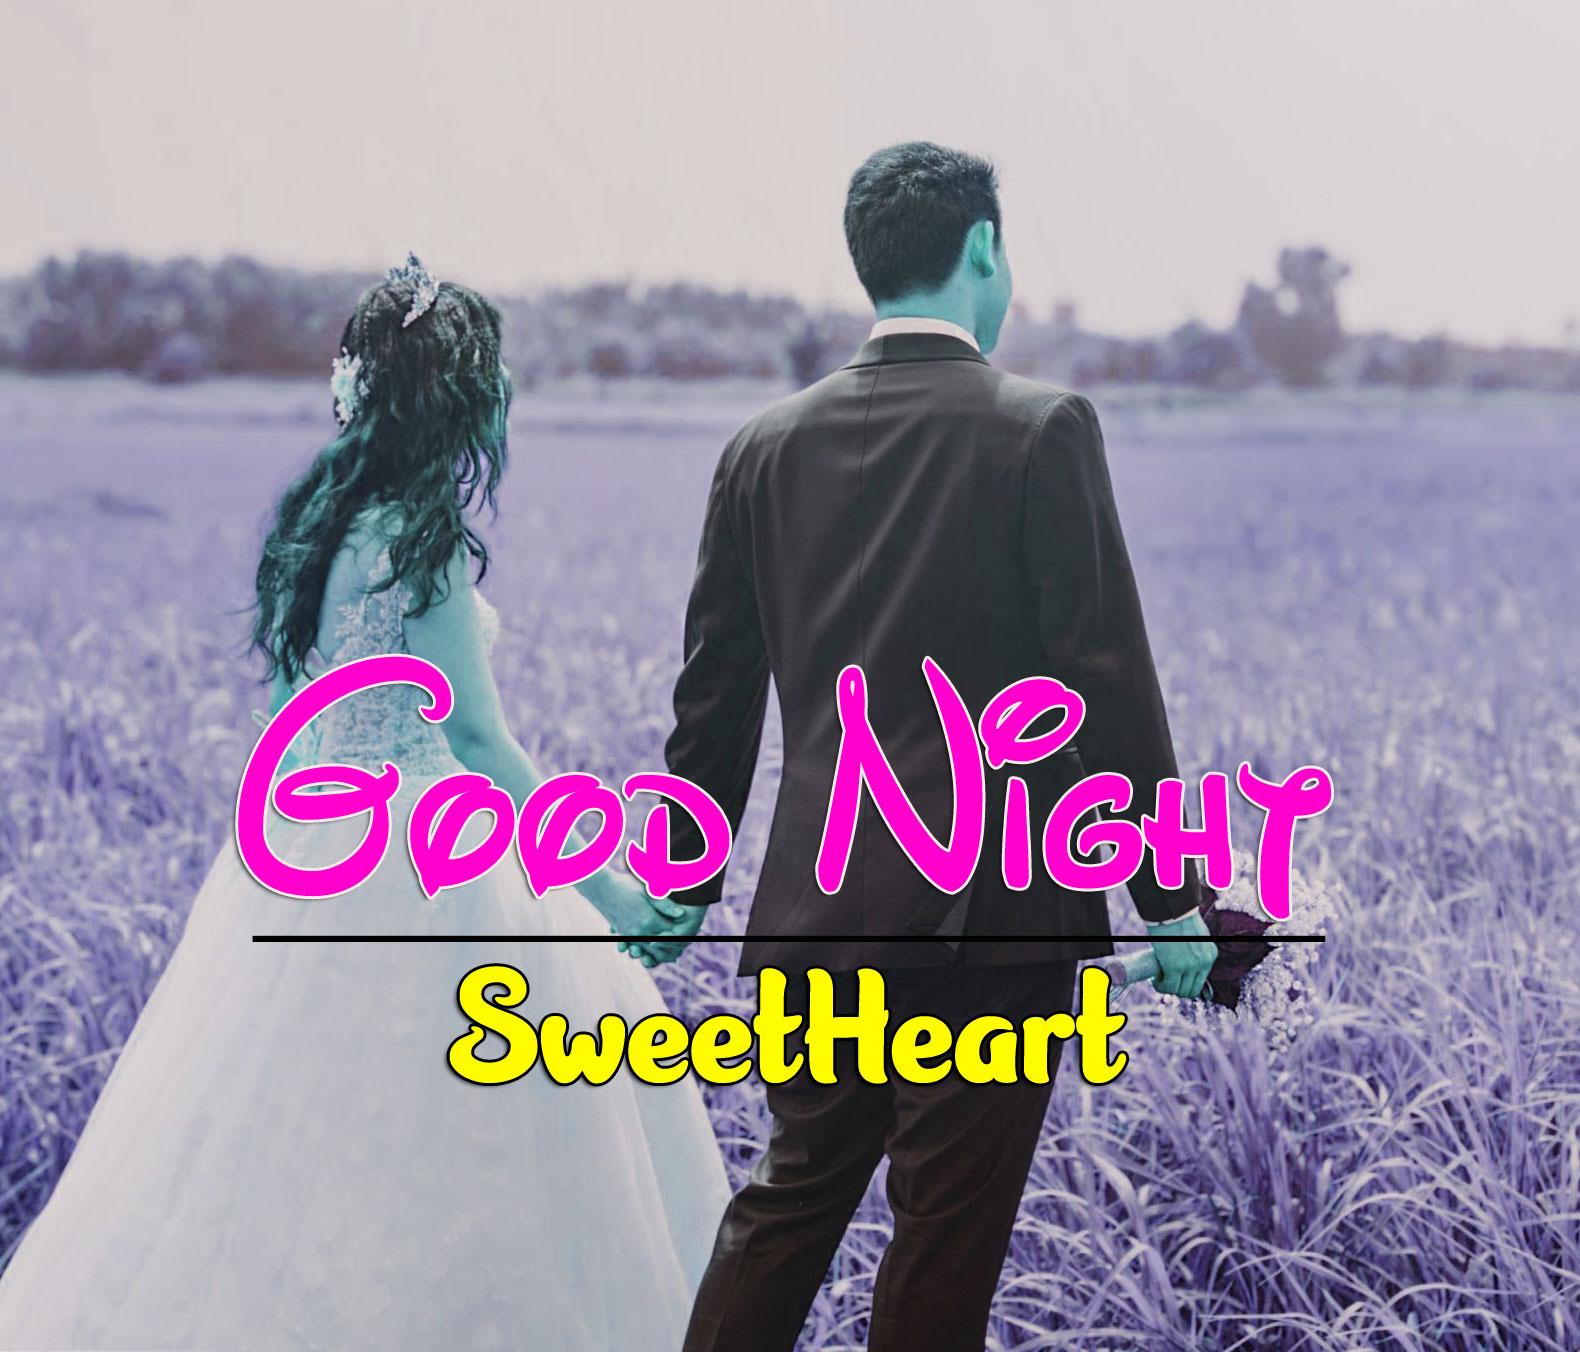 Free HD Girlfriend Good Night Wishes Pics Wallpaper Download